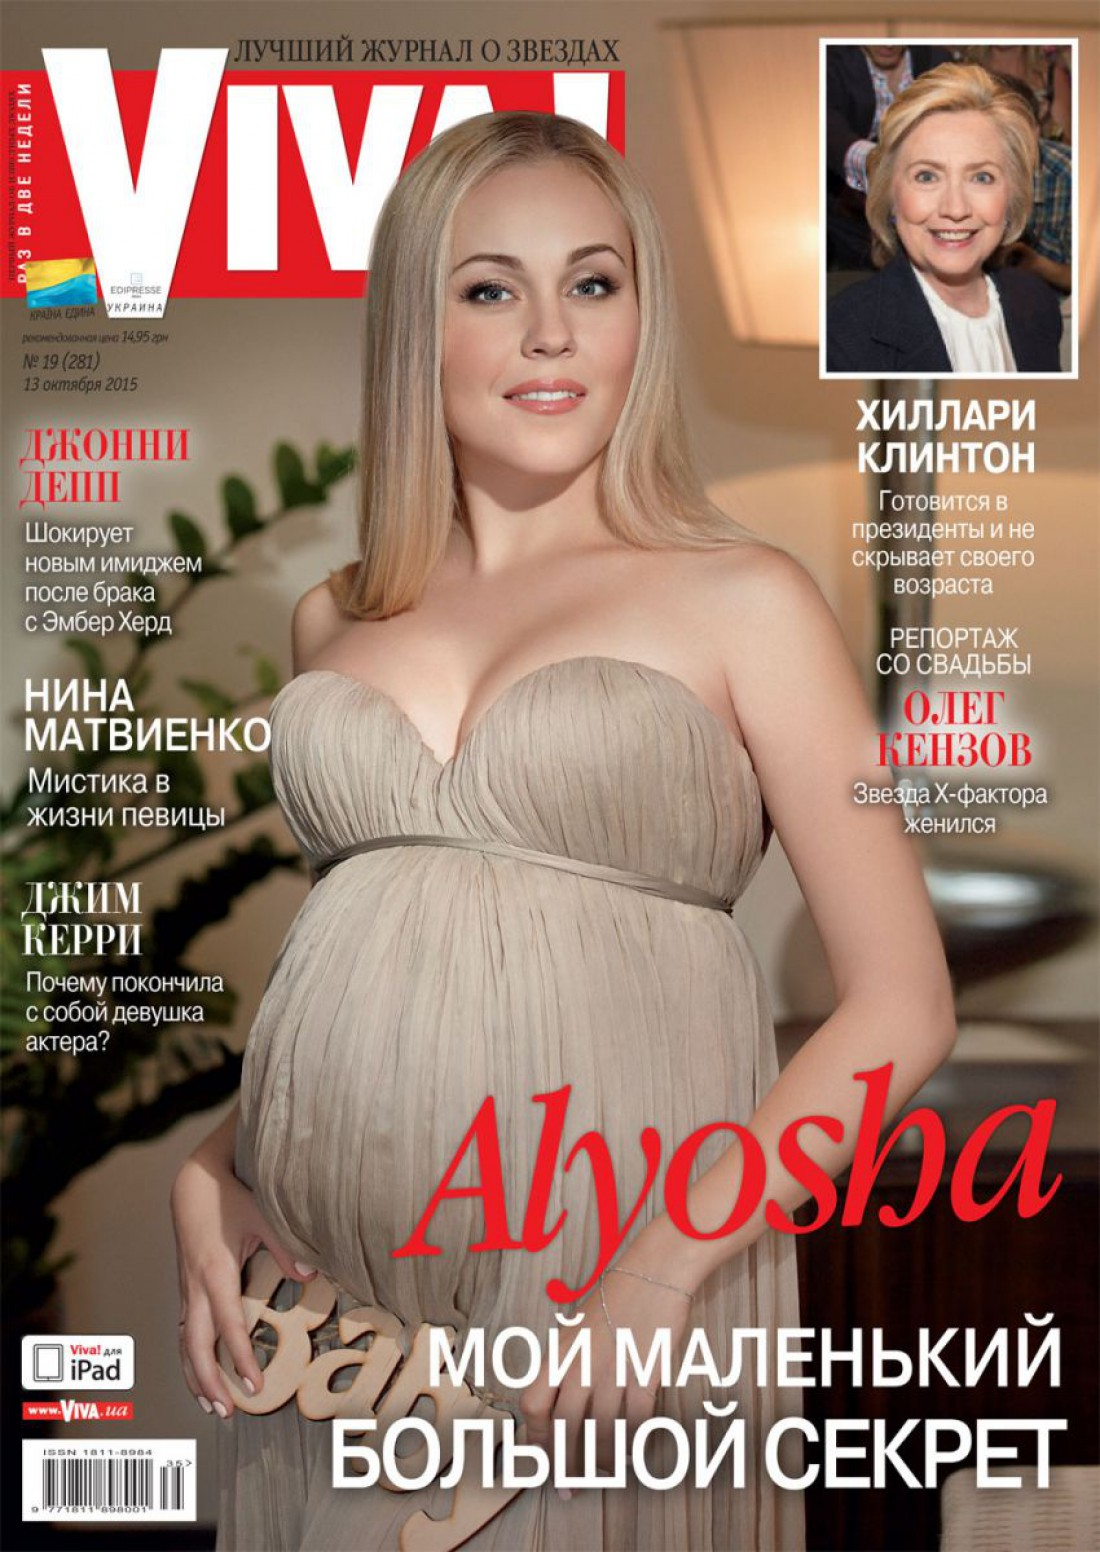 Певица Alyosha беременна во второй раз